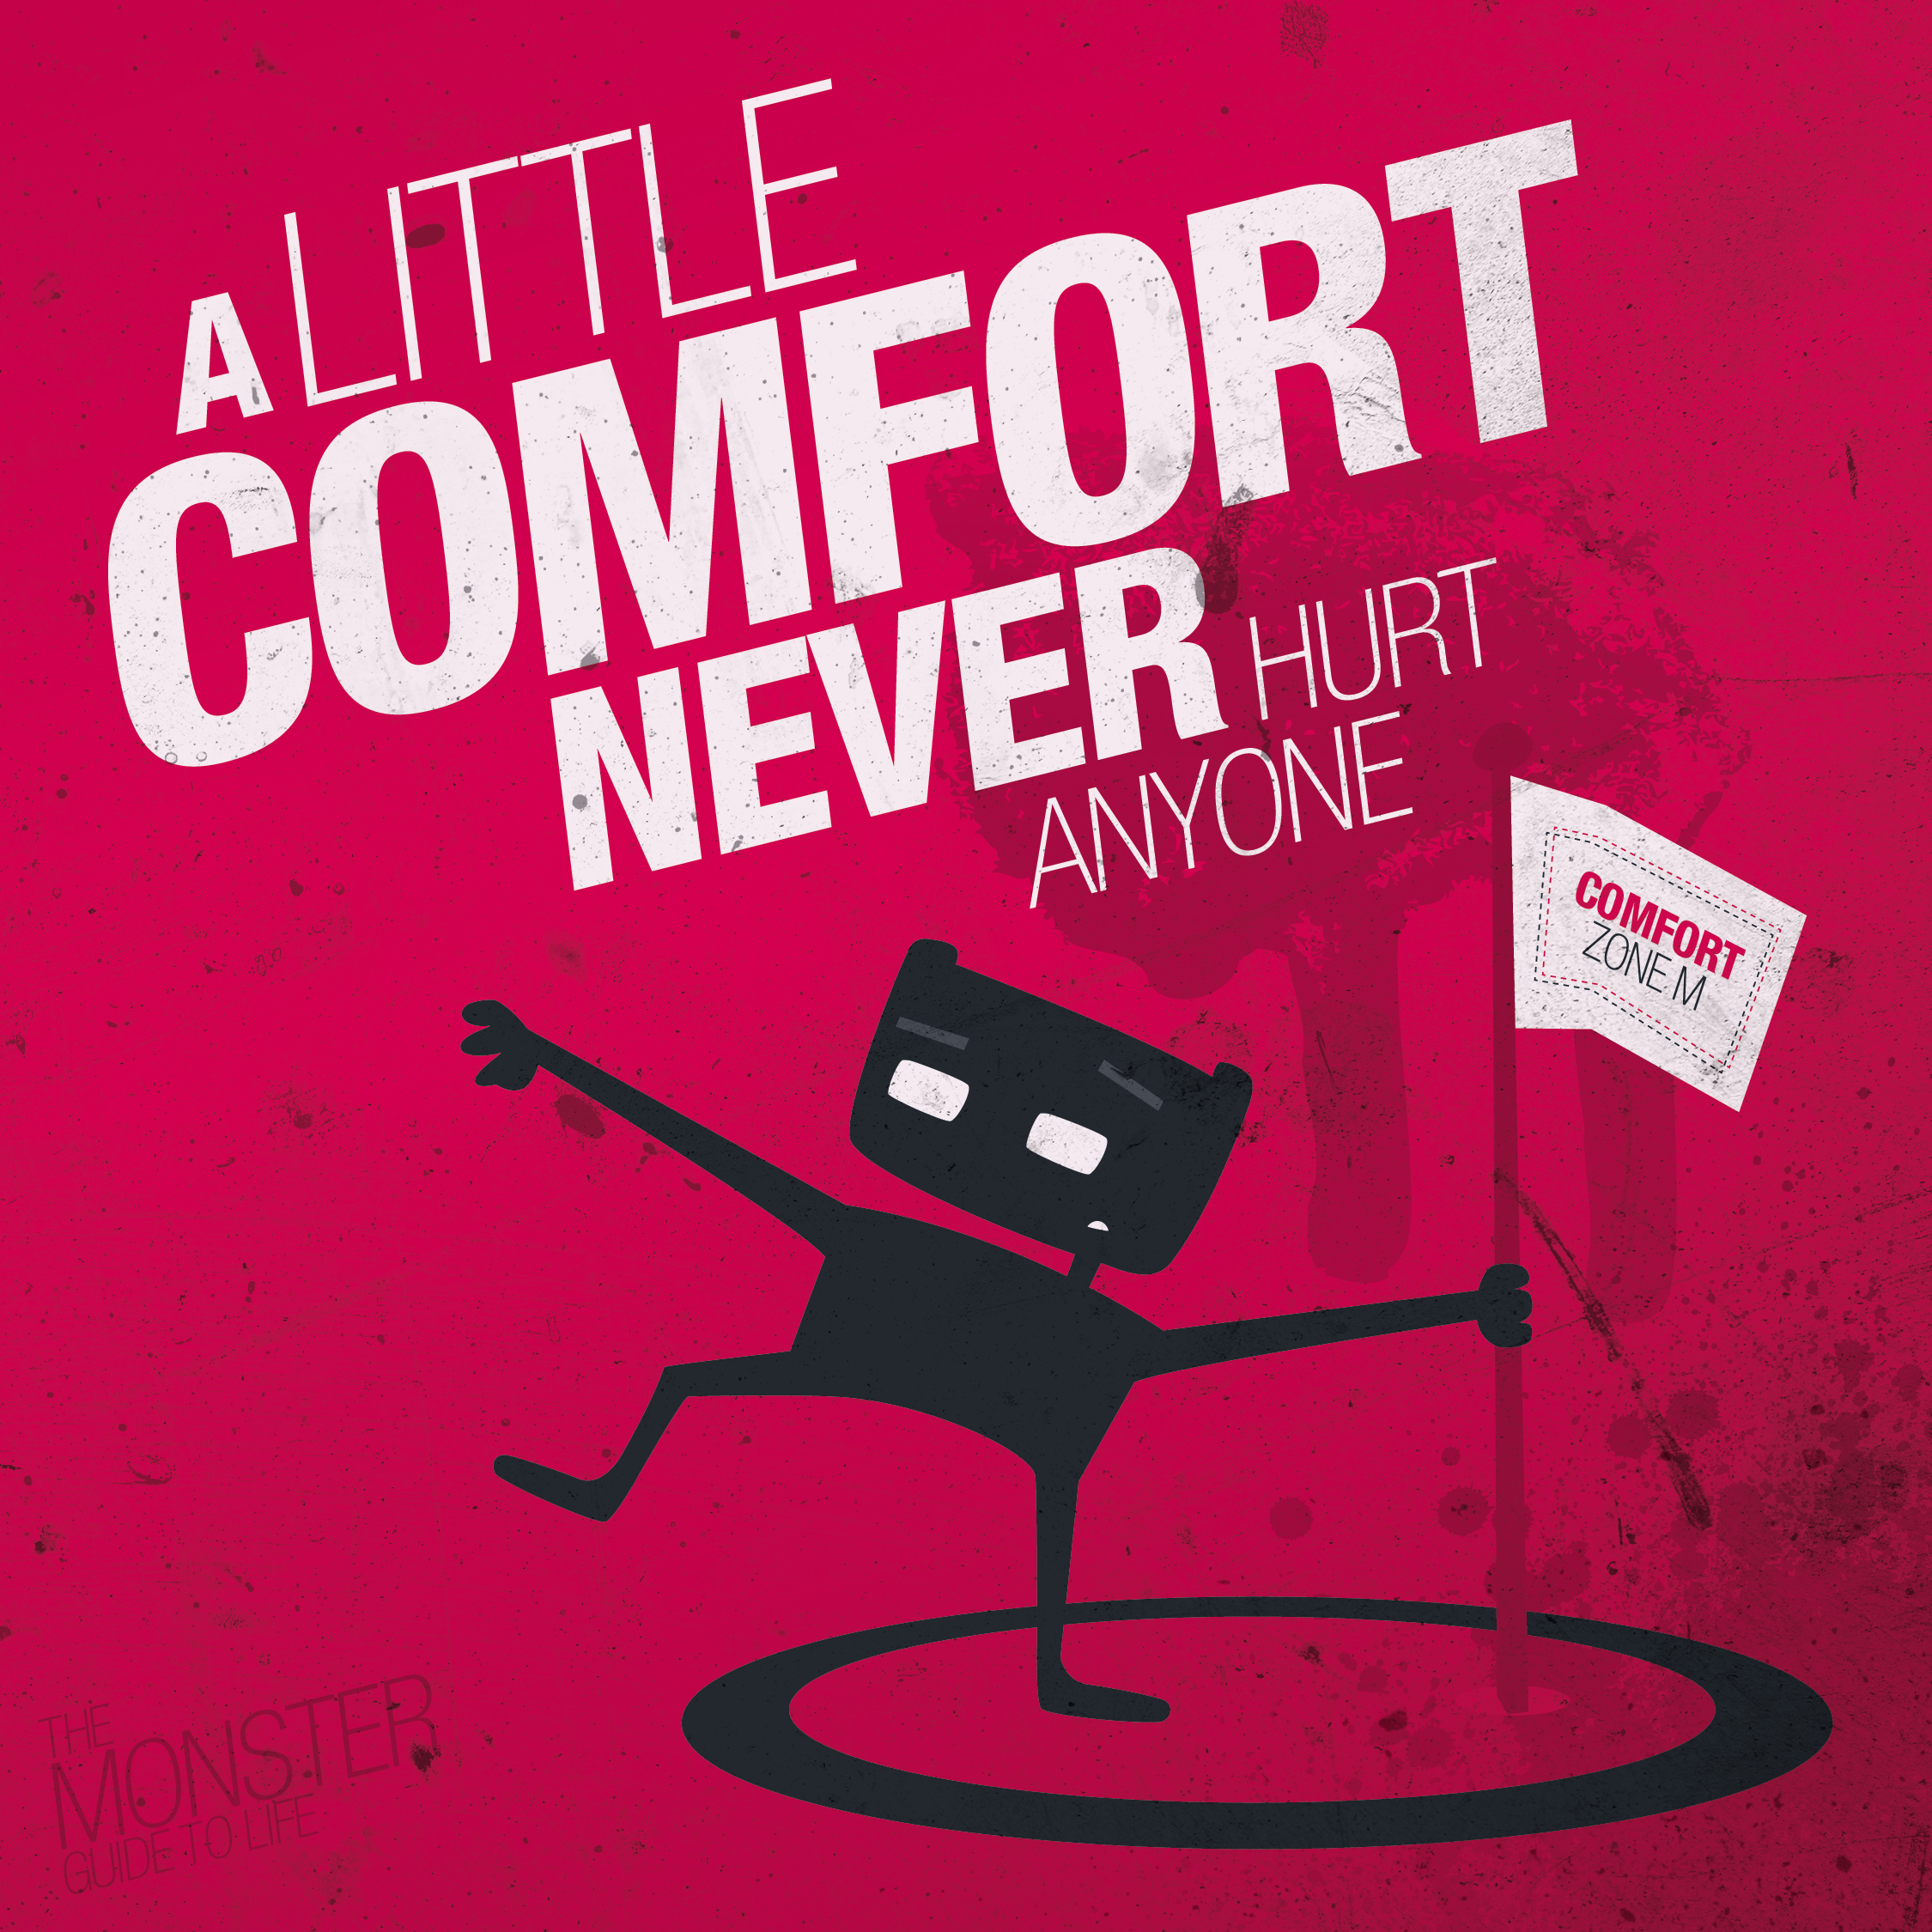 A little comfort never hurt anyone illustration